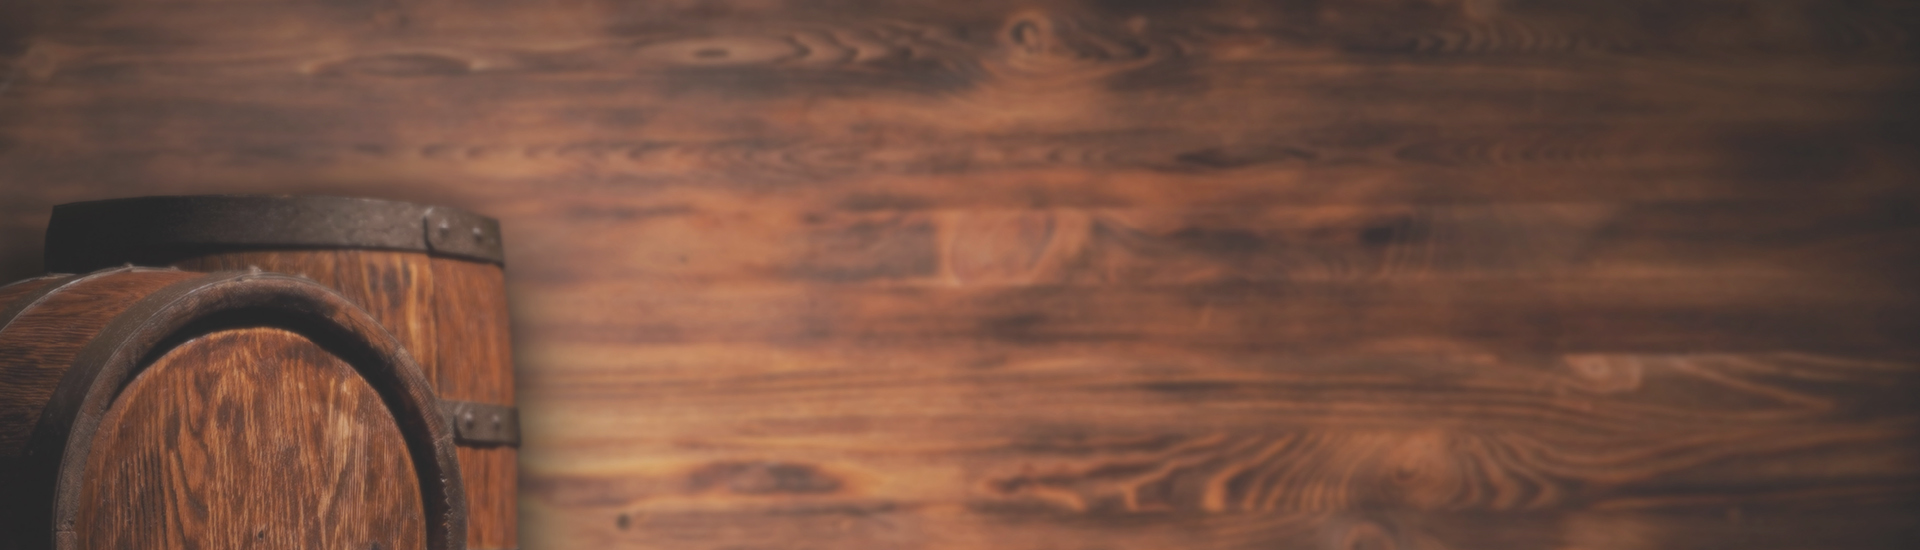 Spirituosen - Auf ALLE Premium Grappe -20% 06/2018 - Slider